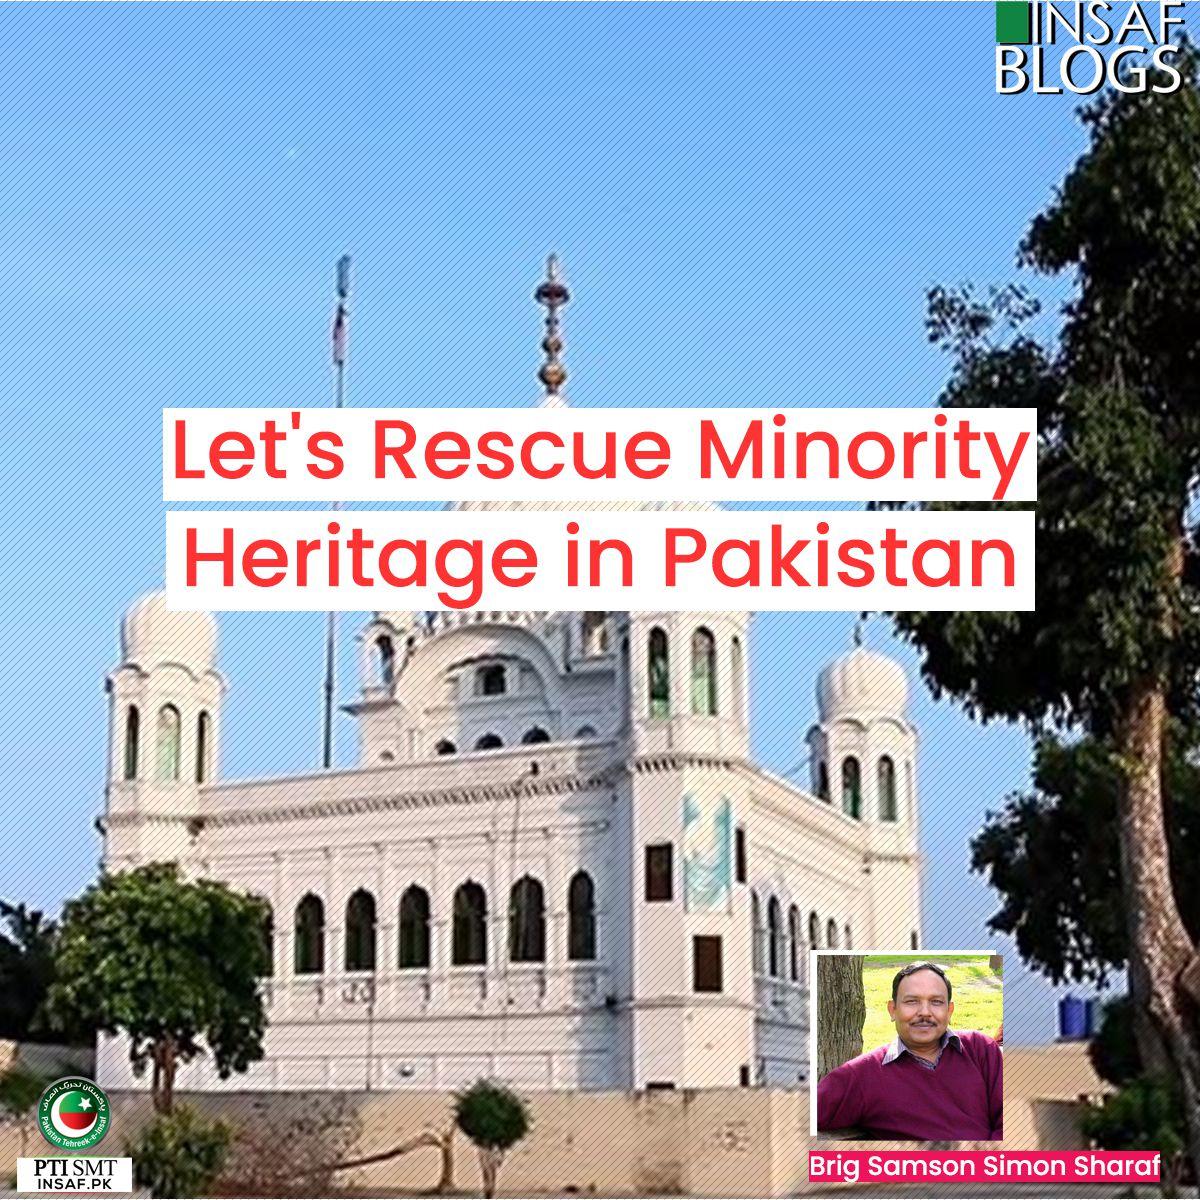 Rescue Minority Heritage in Pakistan Insaf Blog